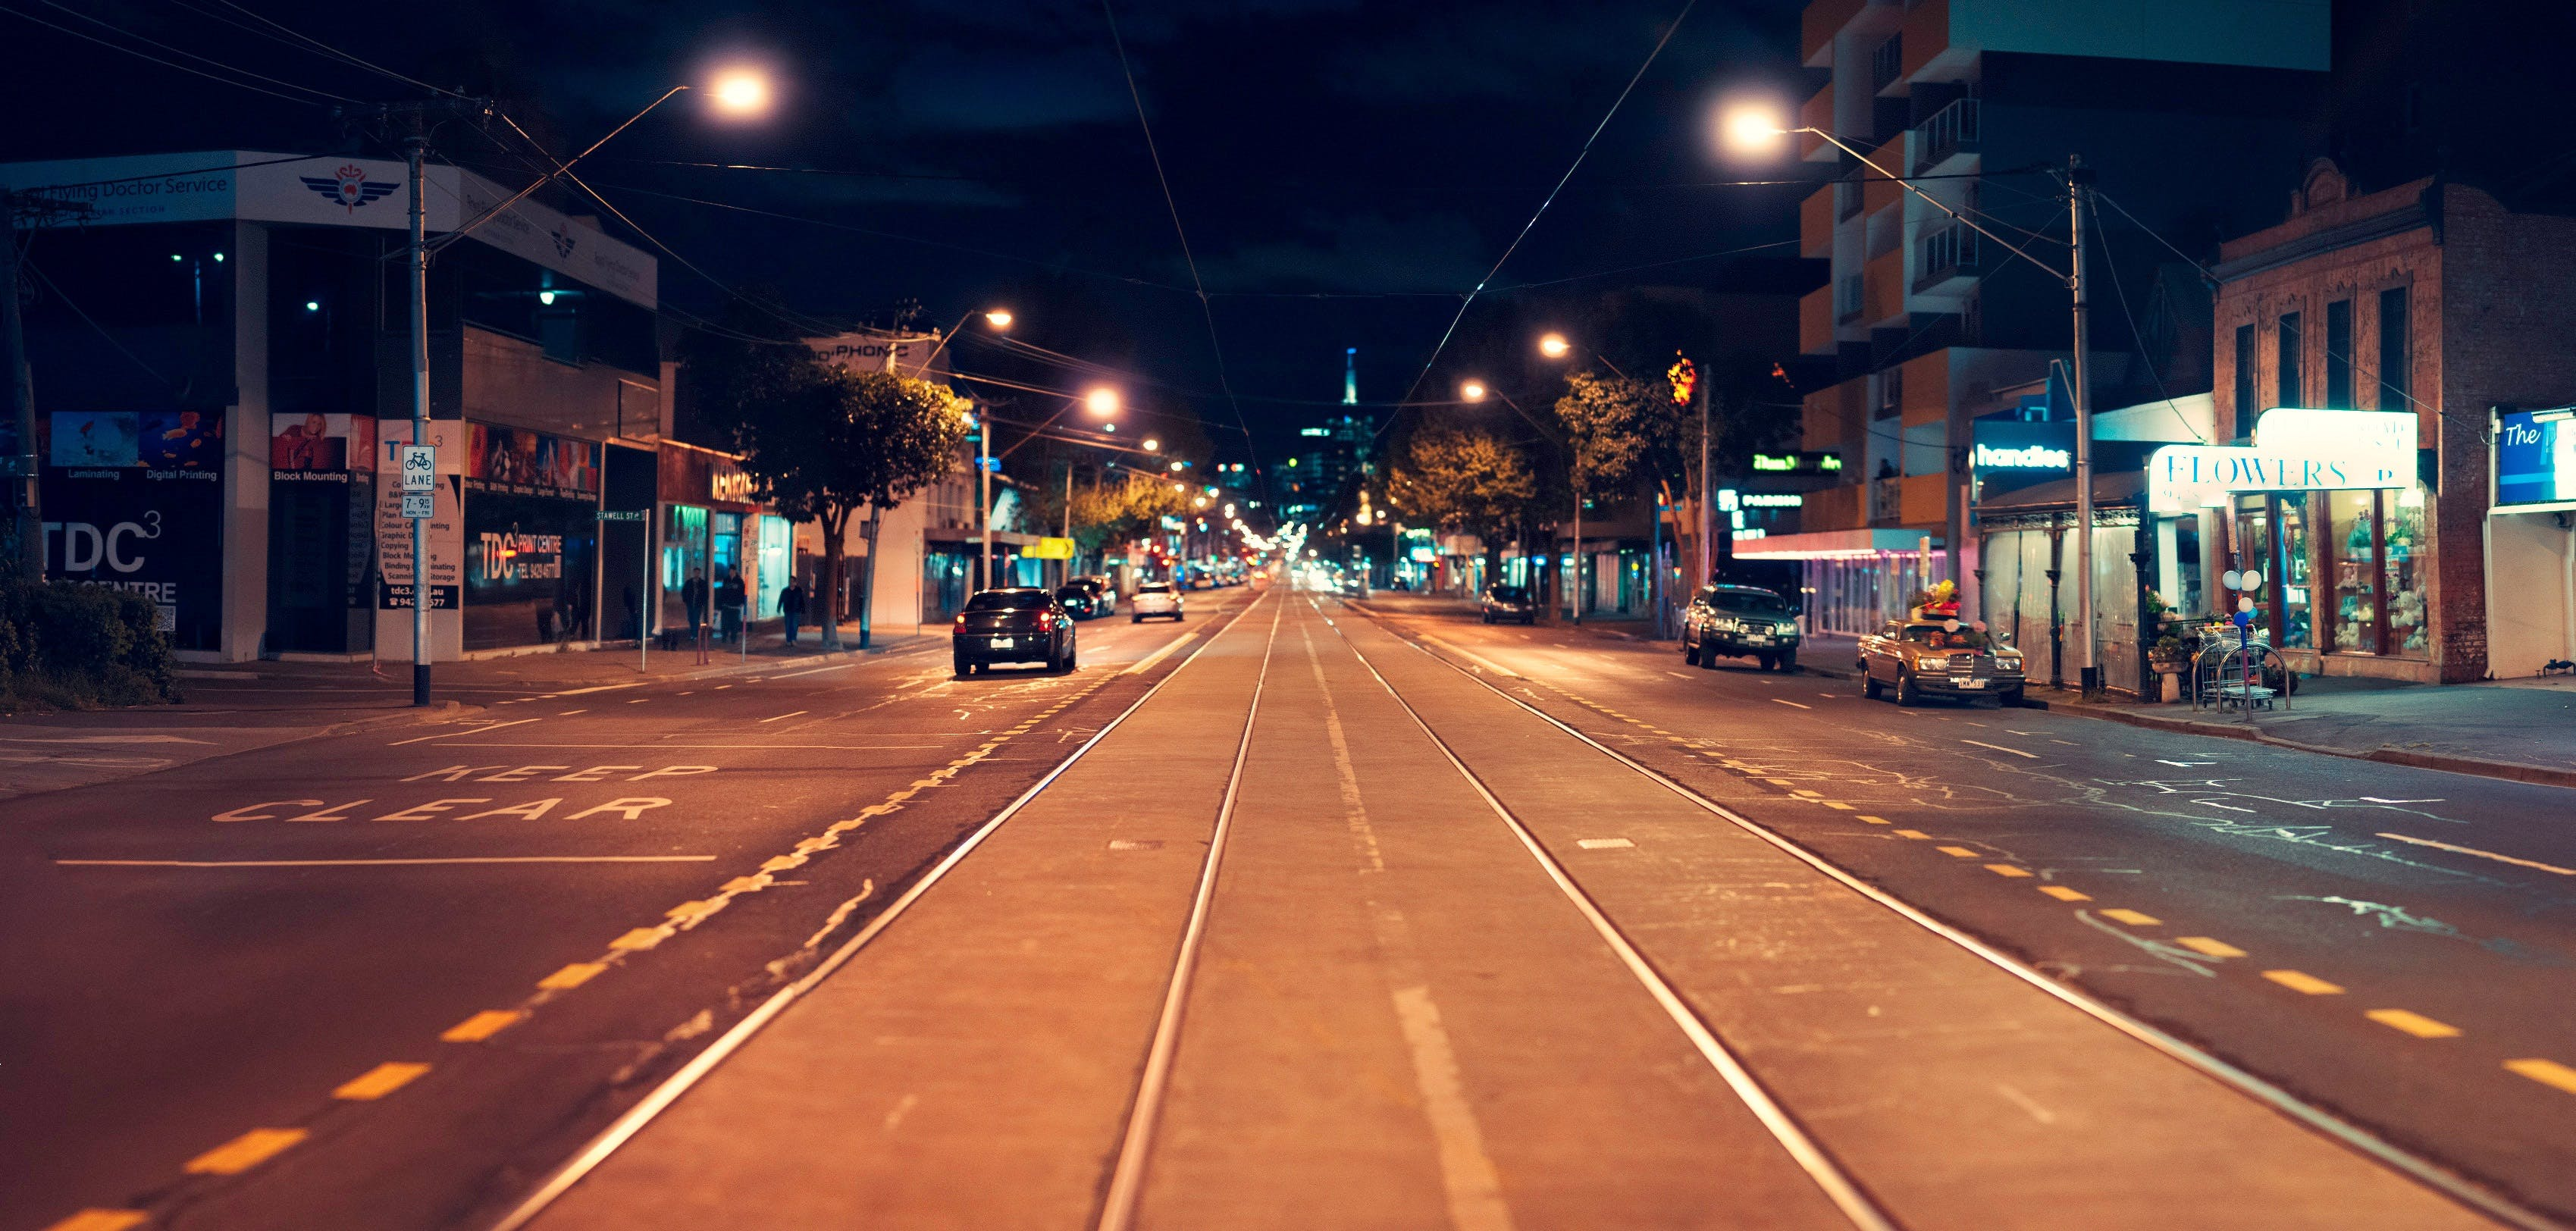 asphalt, buildings, cars